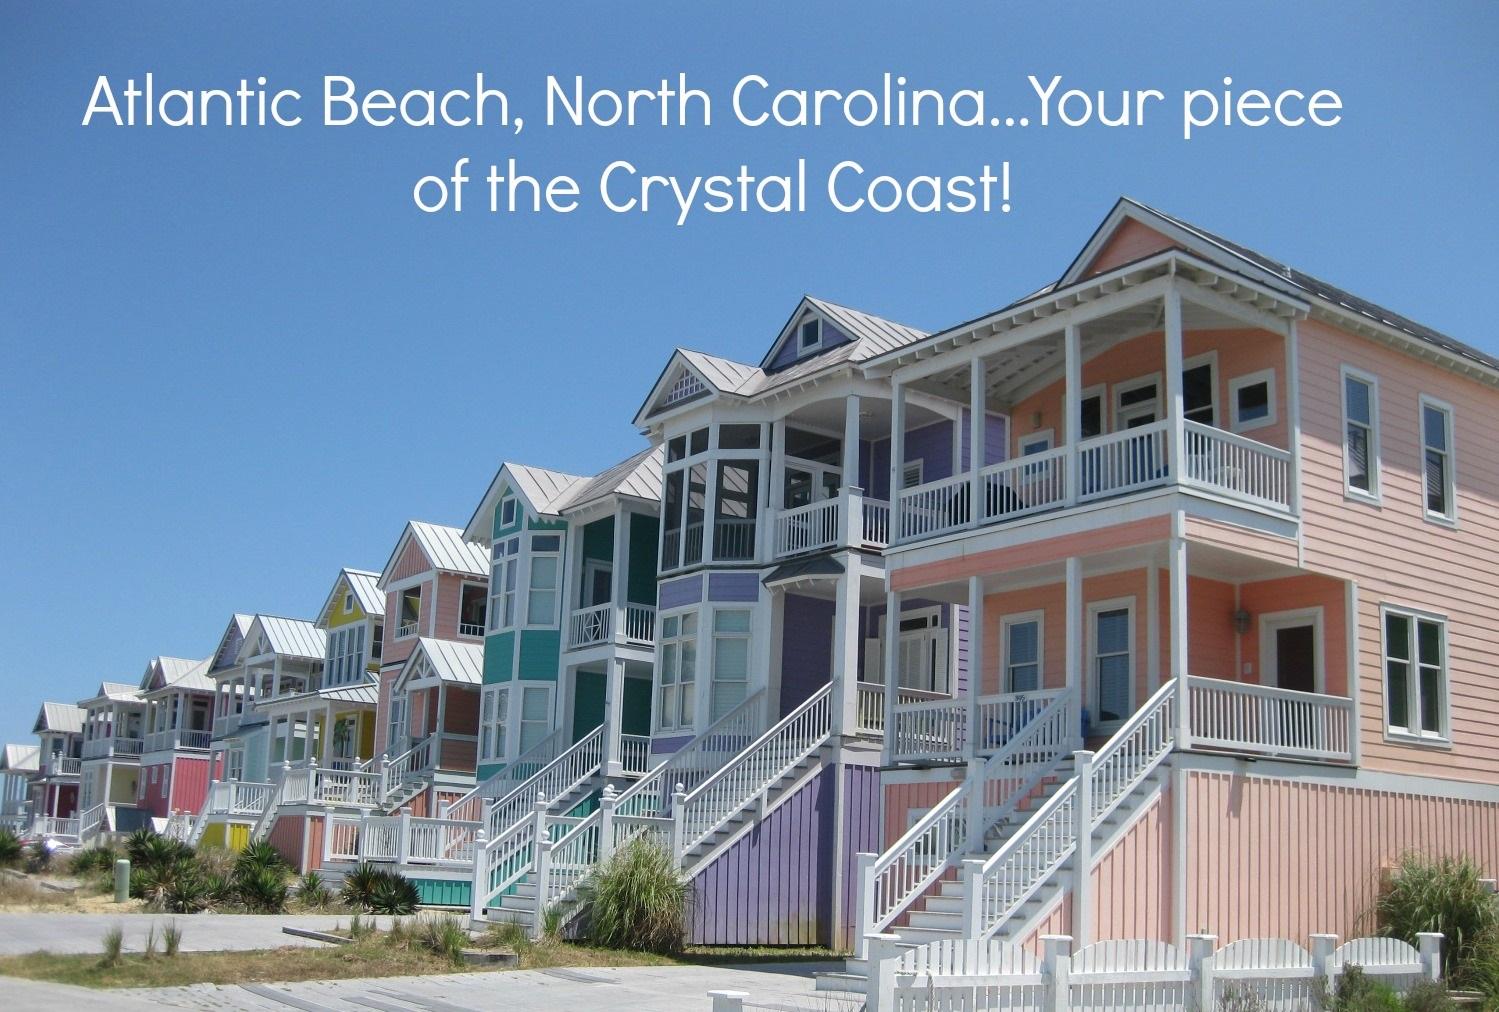 atlantic beach real estate and homes for sale atlantic beach north carolina